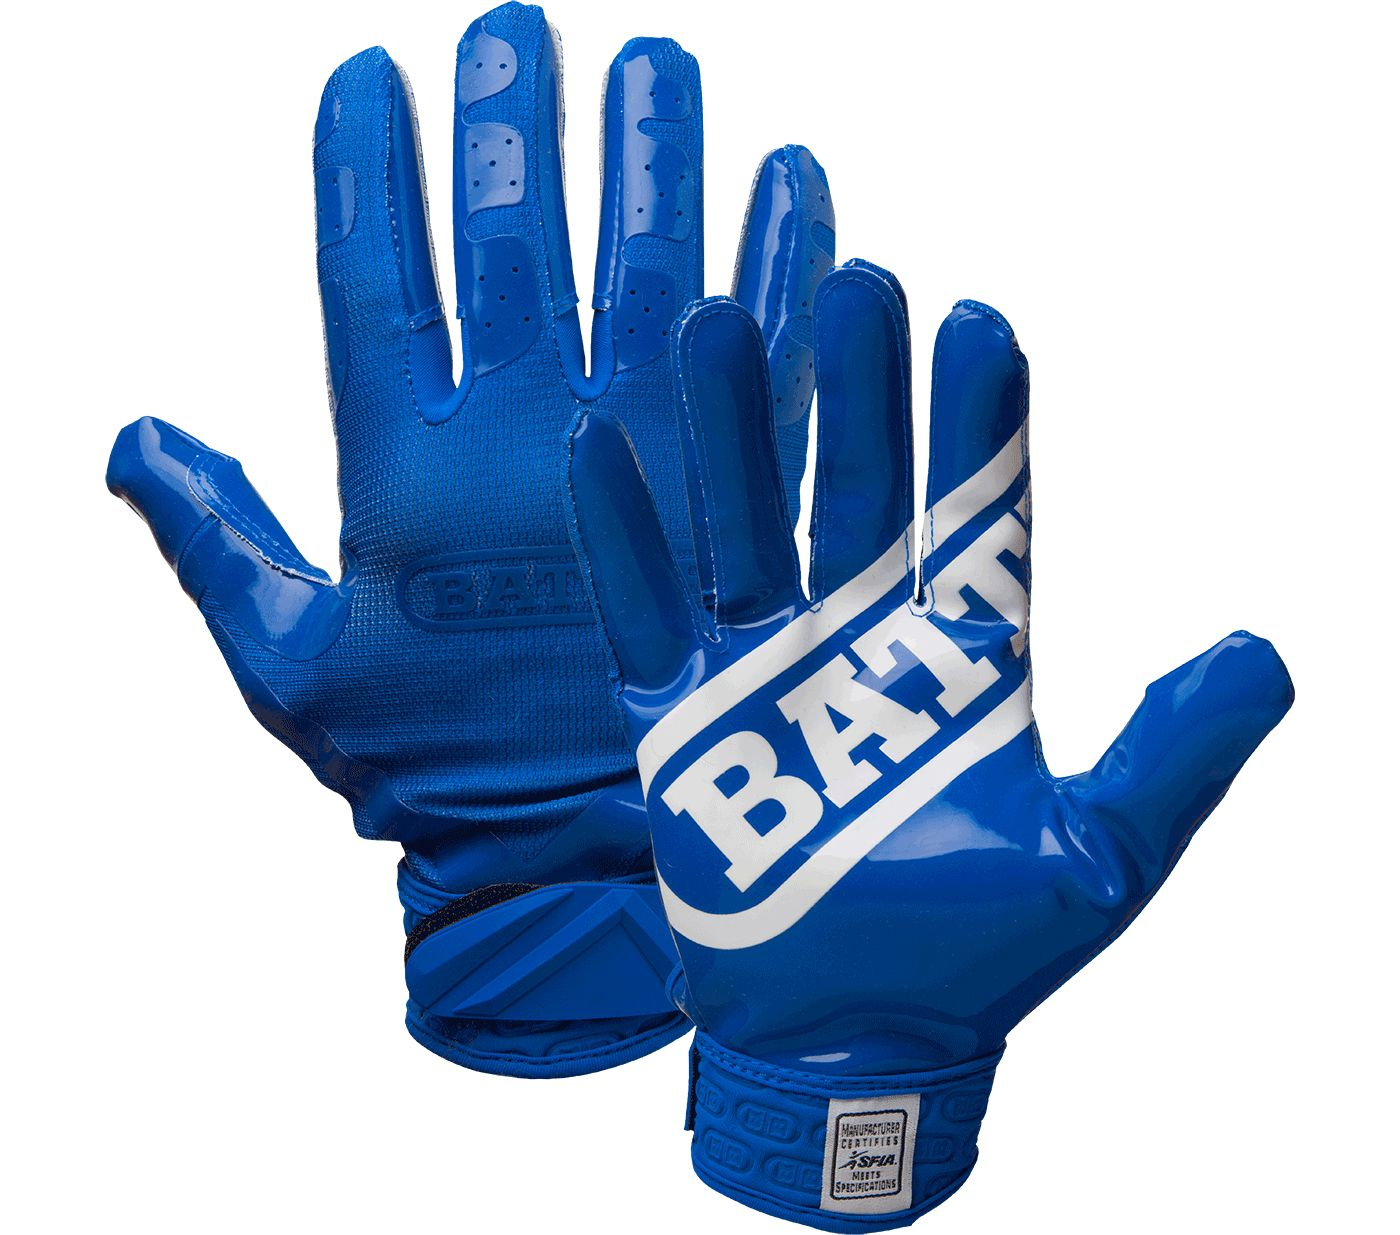 Battle DoubleThreat Adult Football Gloves